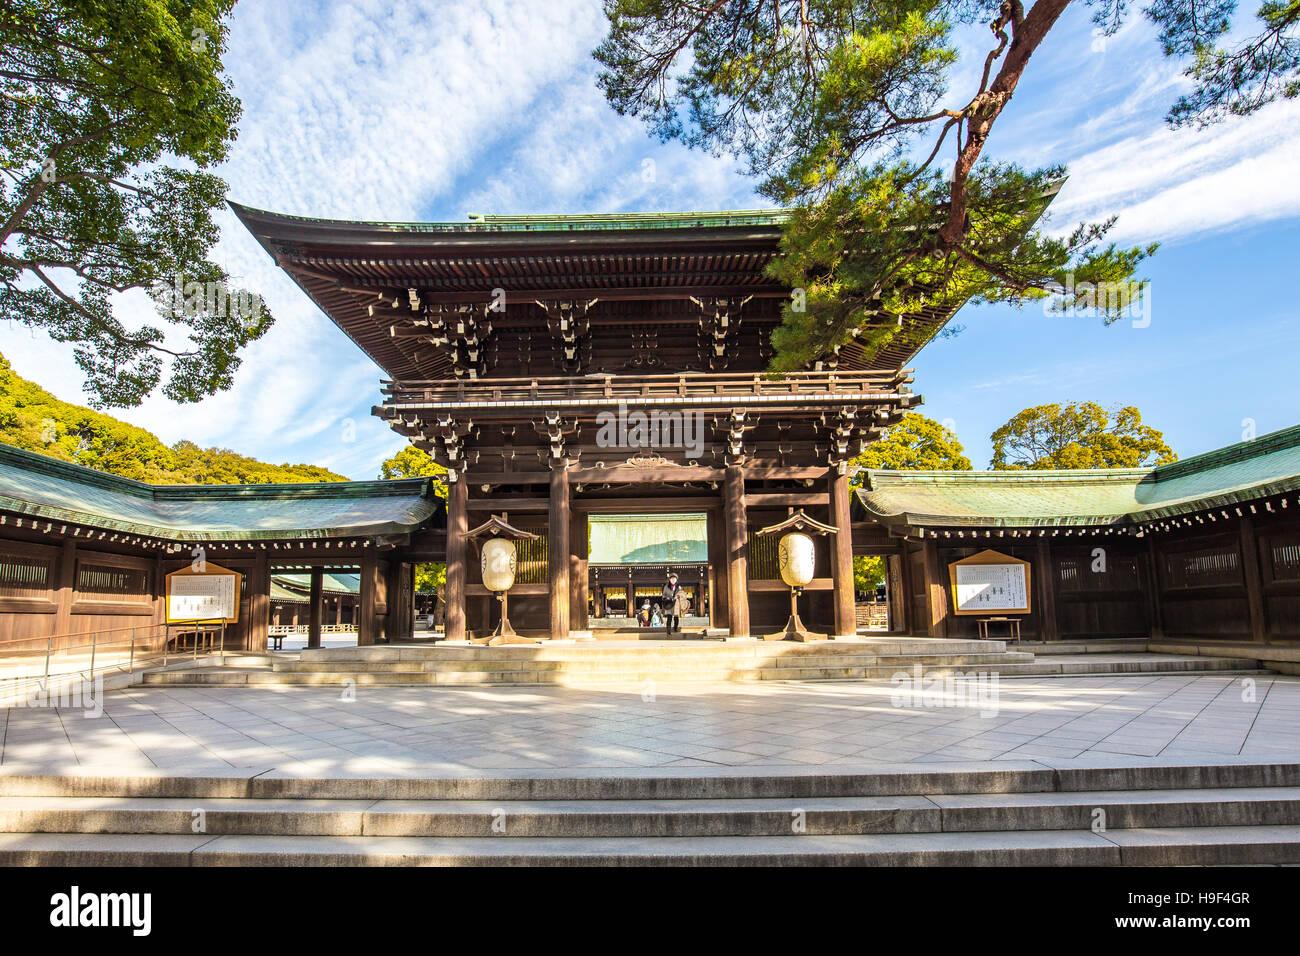 Tokyo, Japan - February 16, 2015: Meiji Jingu Shrine in Shibuya, Tokyo- Japan. - Stock Image